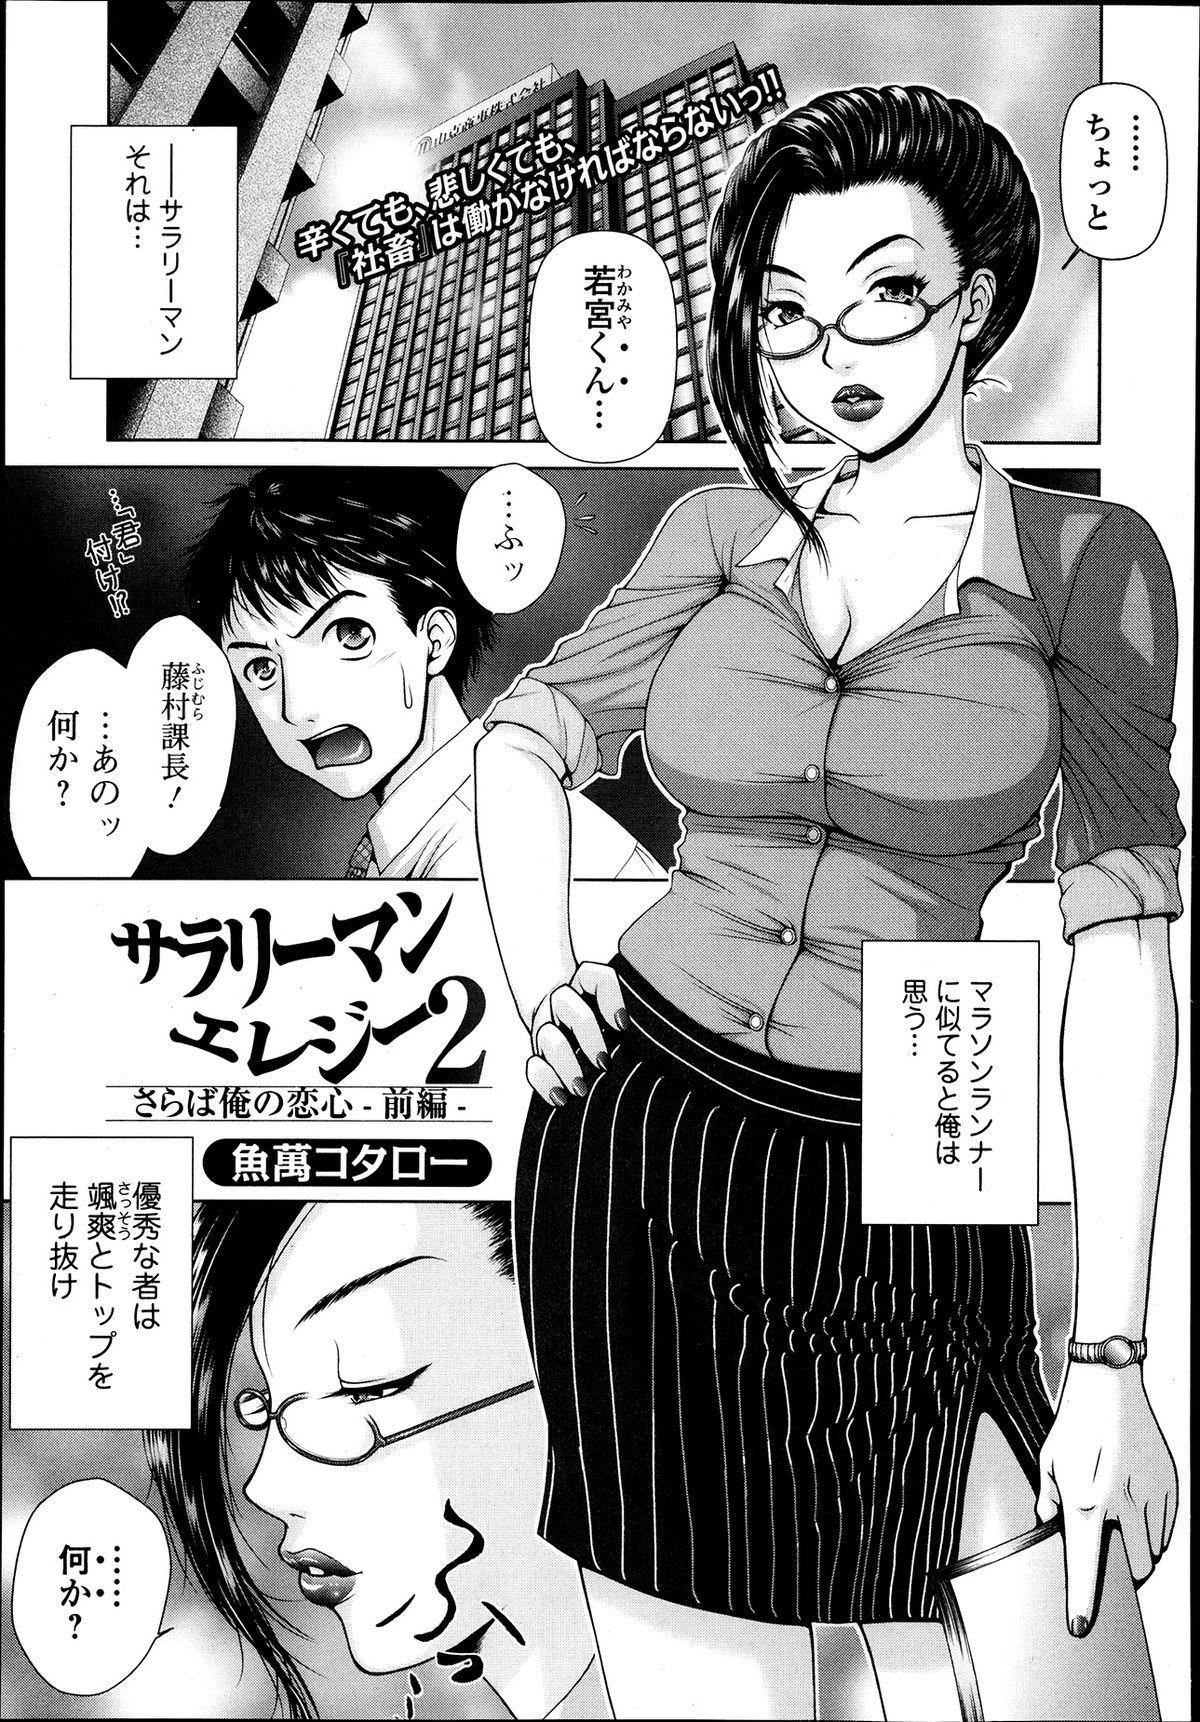 Bishoujo Kakumei KIWAME Road Vol.9 156